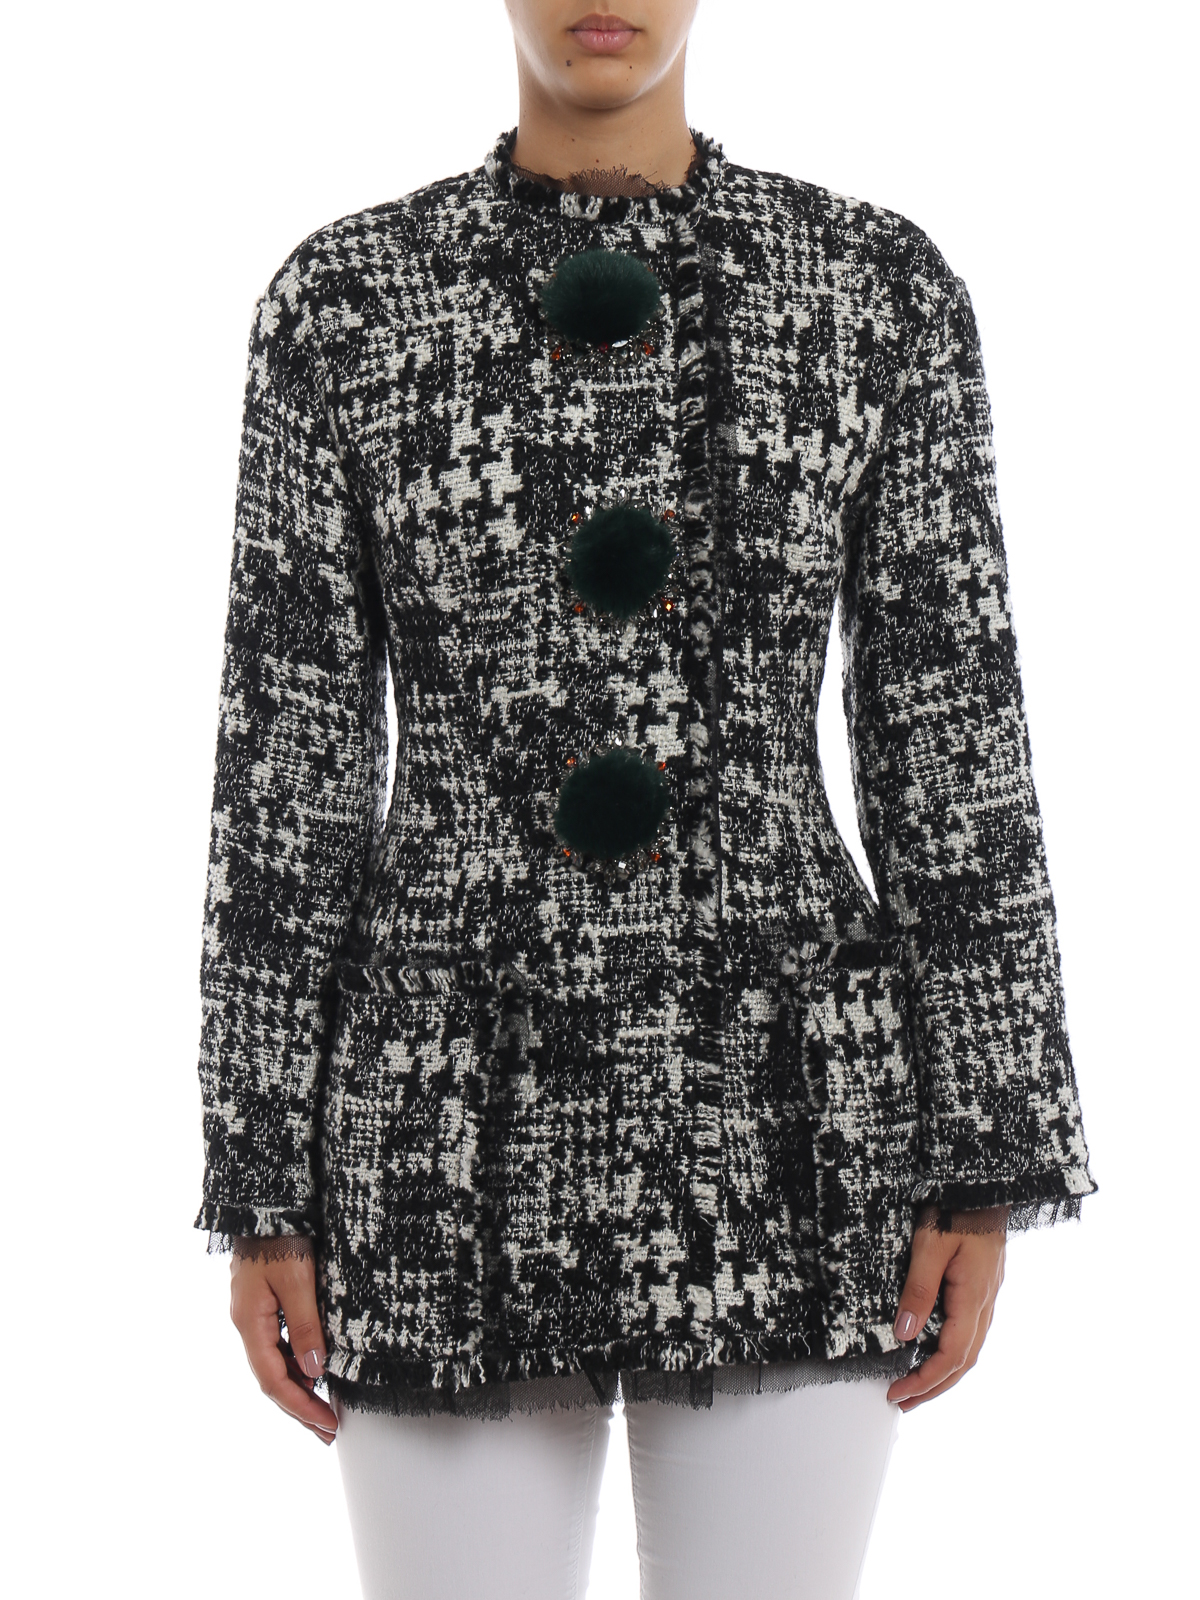 Dolce   Gabbana - Kurzer Mantel - Grau - Kurze Mäntel - F28JNZFMMFJS8030 c9dc2cfdc4